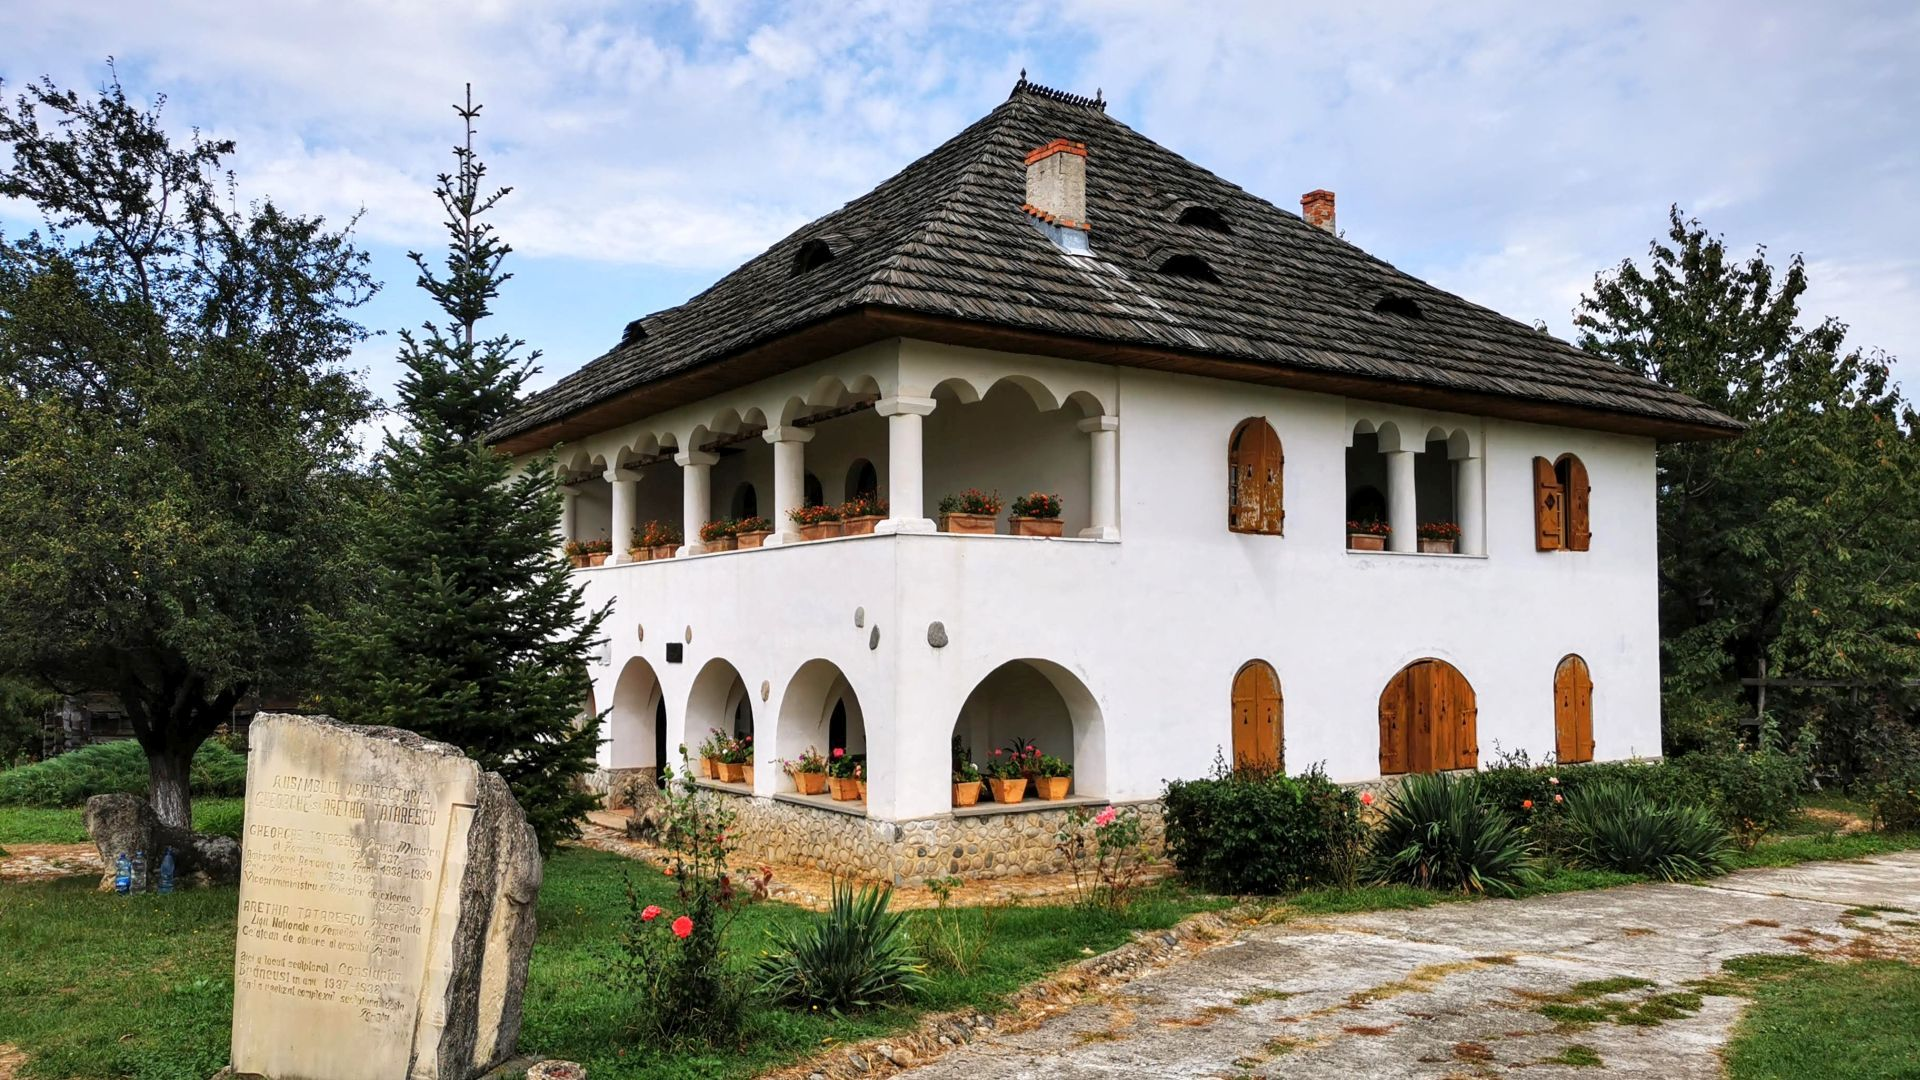 Cula Drugănescu